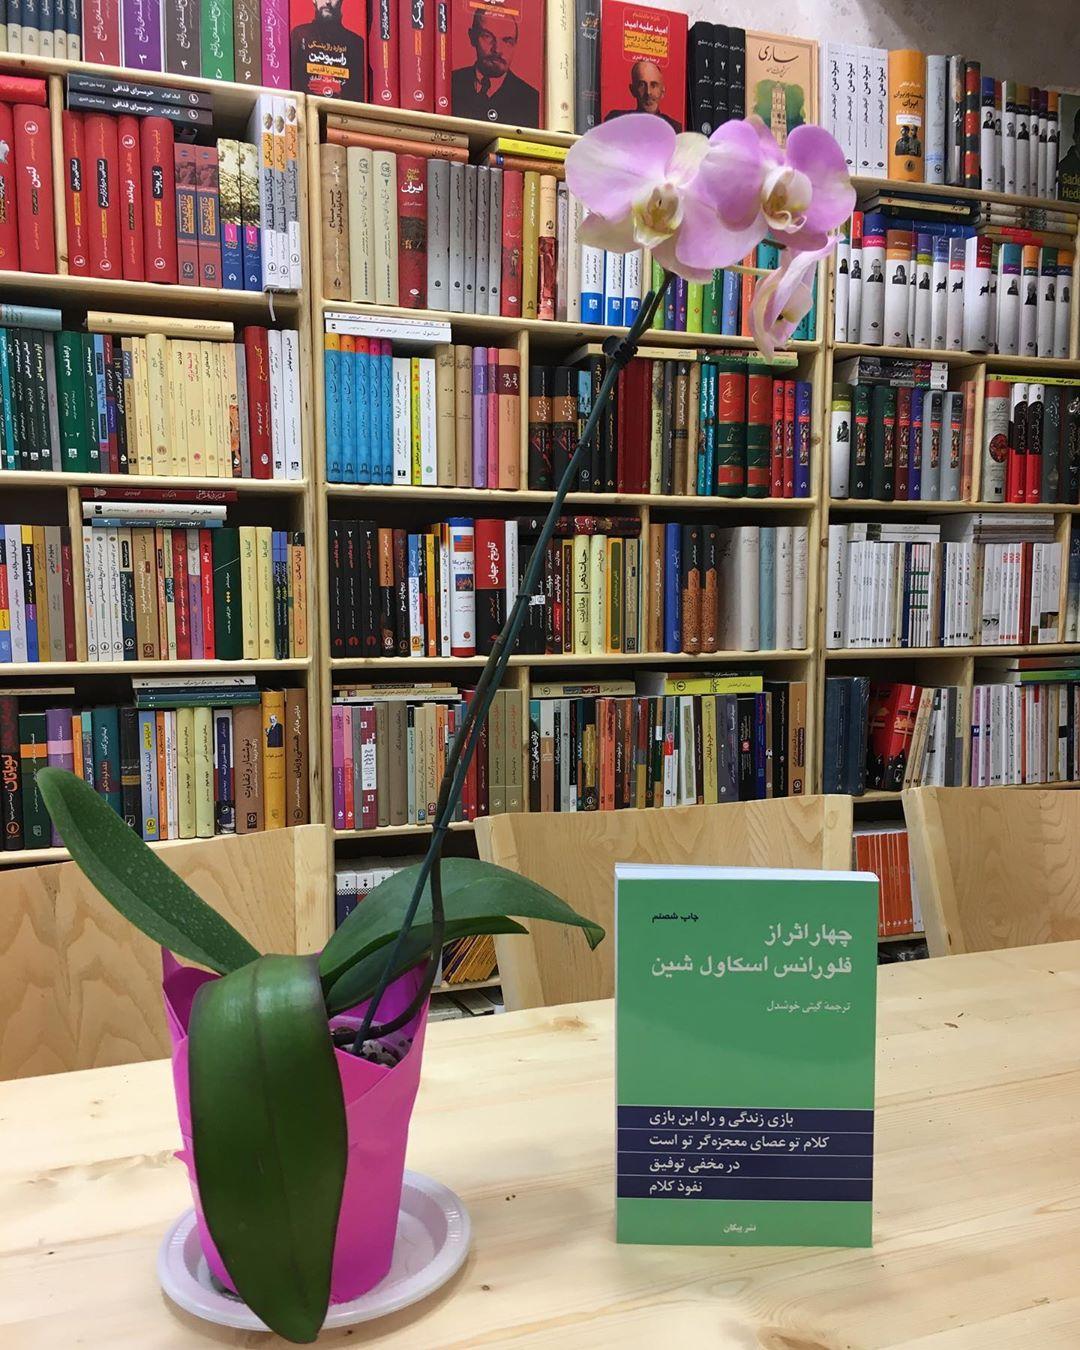 نام كتاب: چهار اثر از فلورانس اسكاول شين نويسنده: فلورانس اسكاول شين مترجم: گيتي 2